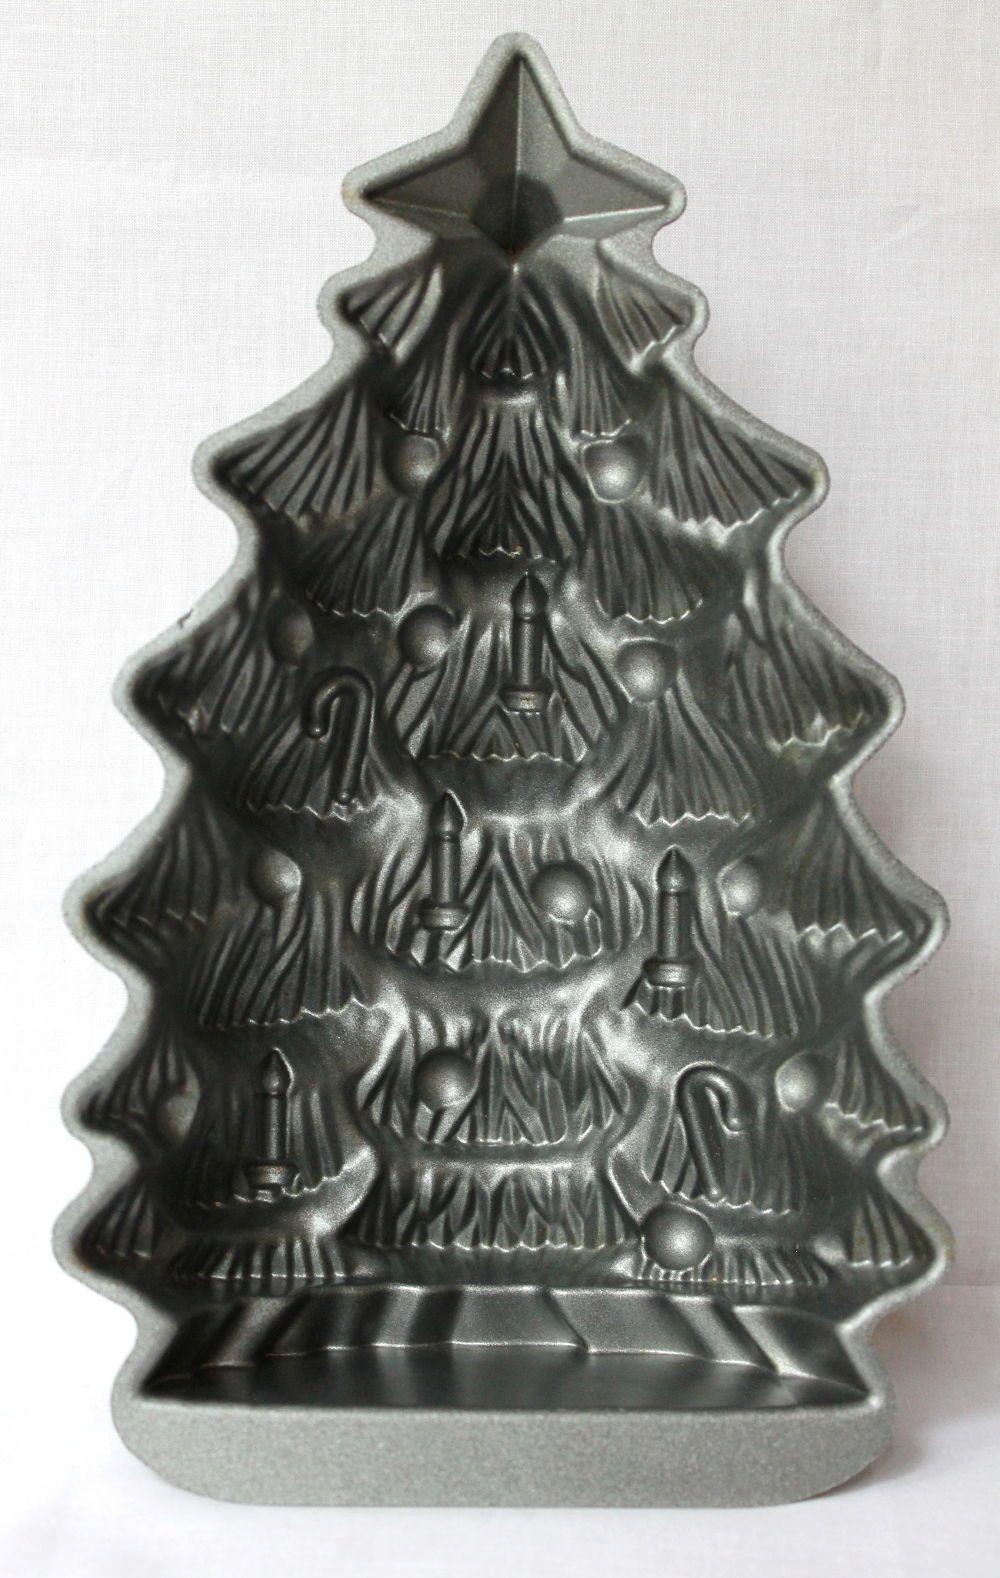 11 Nordic Ware Cast Aluminum Christmas Tree 4 5 Cups Cake Bread Baking Pan Mold Ebay Nordic Ware Aluminum Christmas Tree Bread Baking